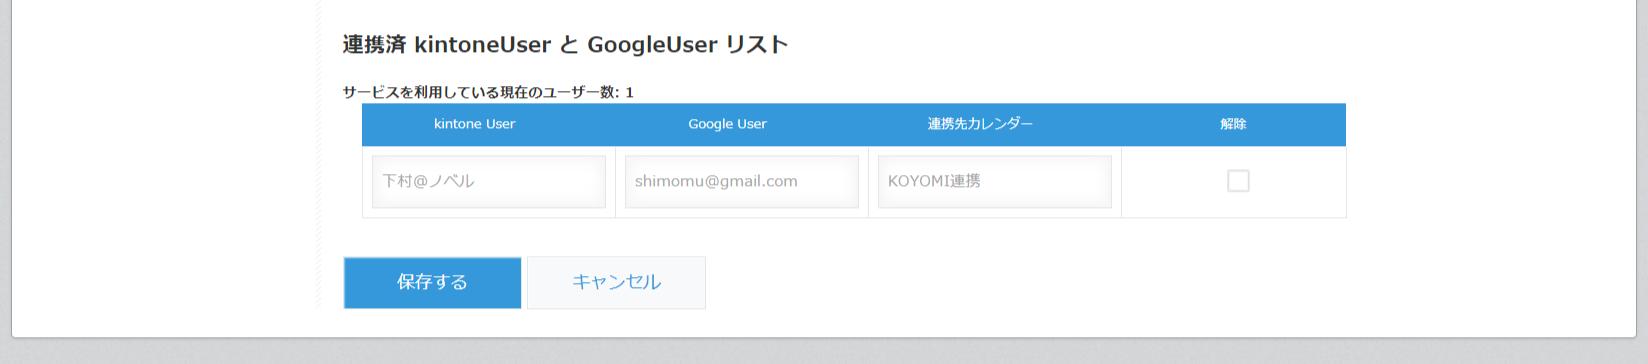 [kintone_googleカレンダー連携プラグイン]KOYOMI_ユーザーリスト